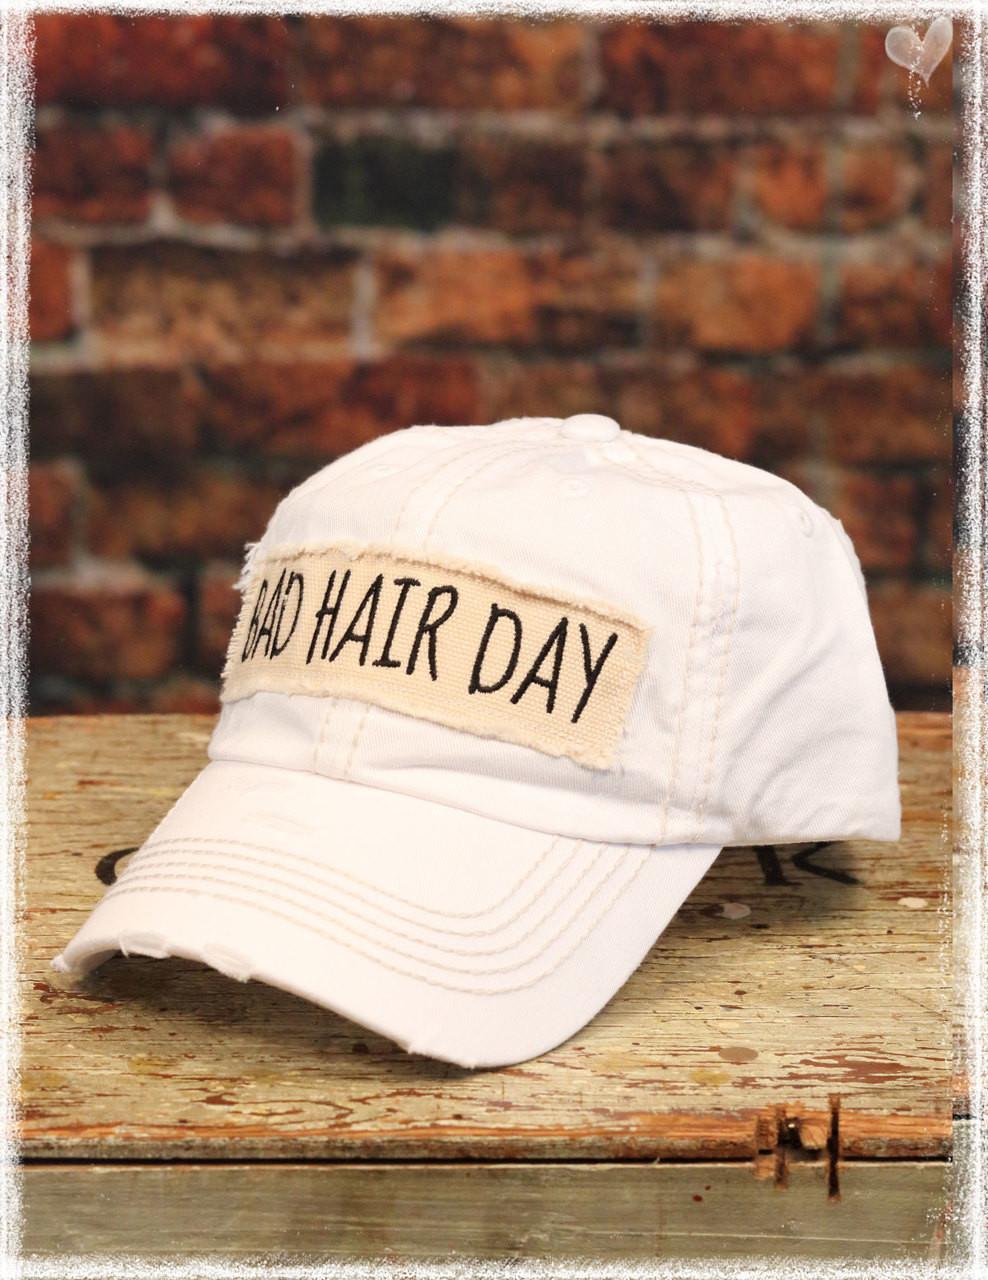 White Bad Hair Day baseball hat by Dang Chicks